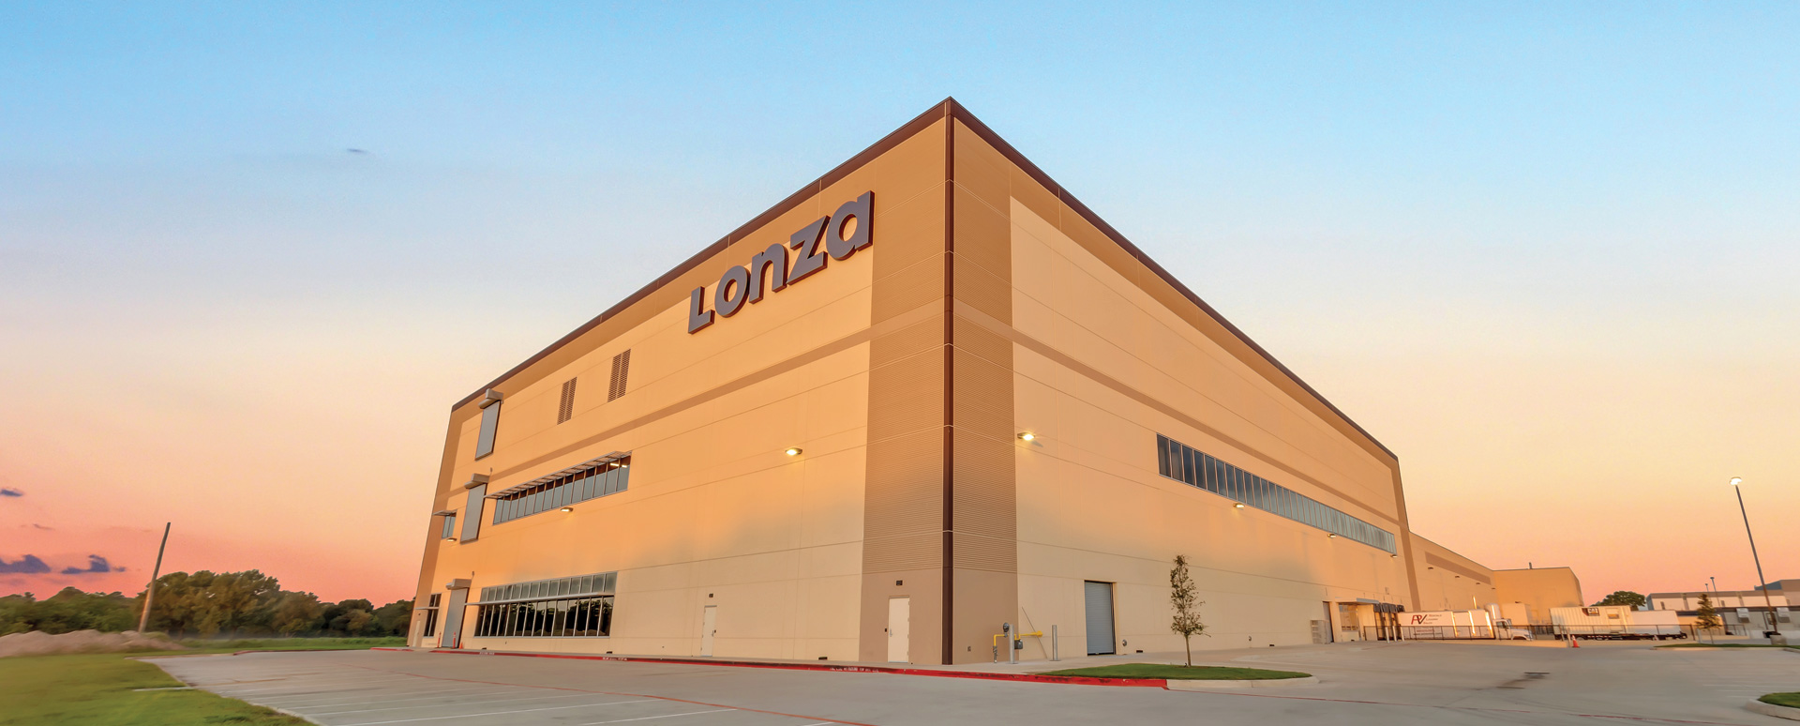 LONZA - Pearland, TX 4